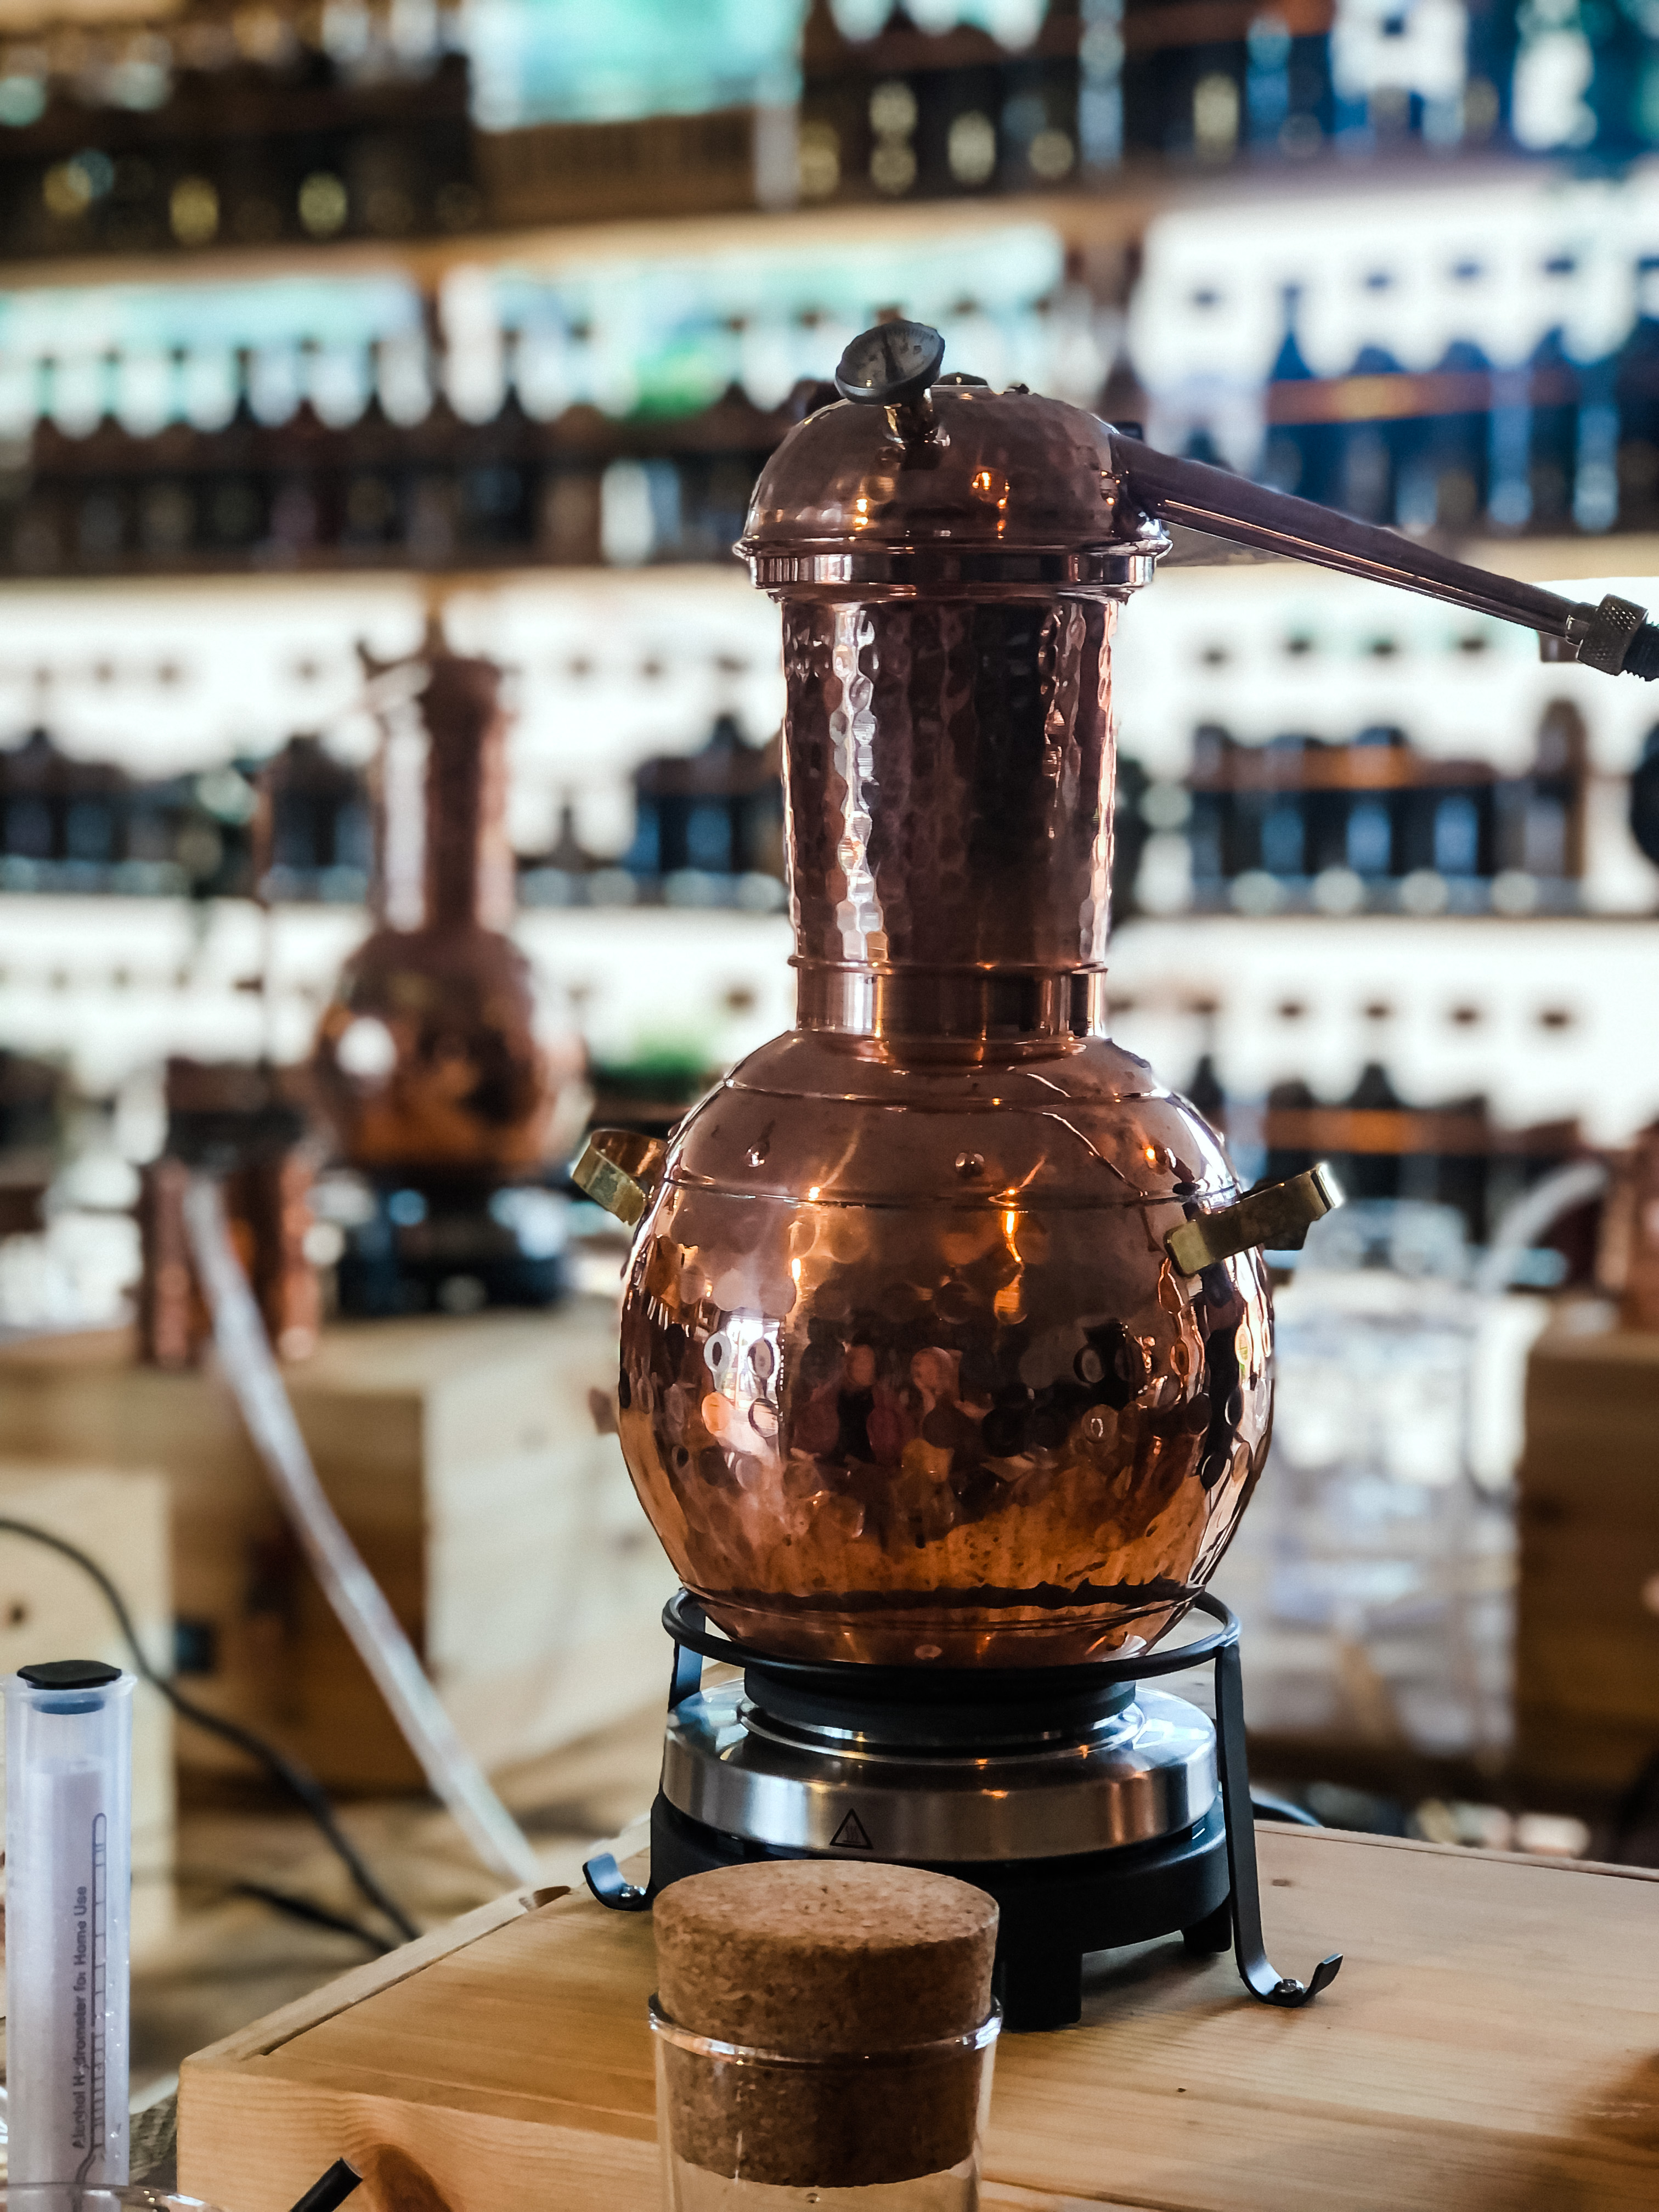 Gin School Copper Pot at Silverstone Distillery